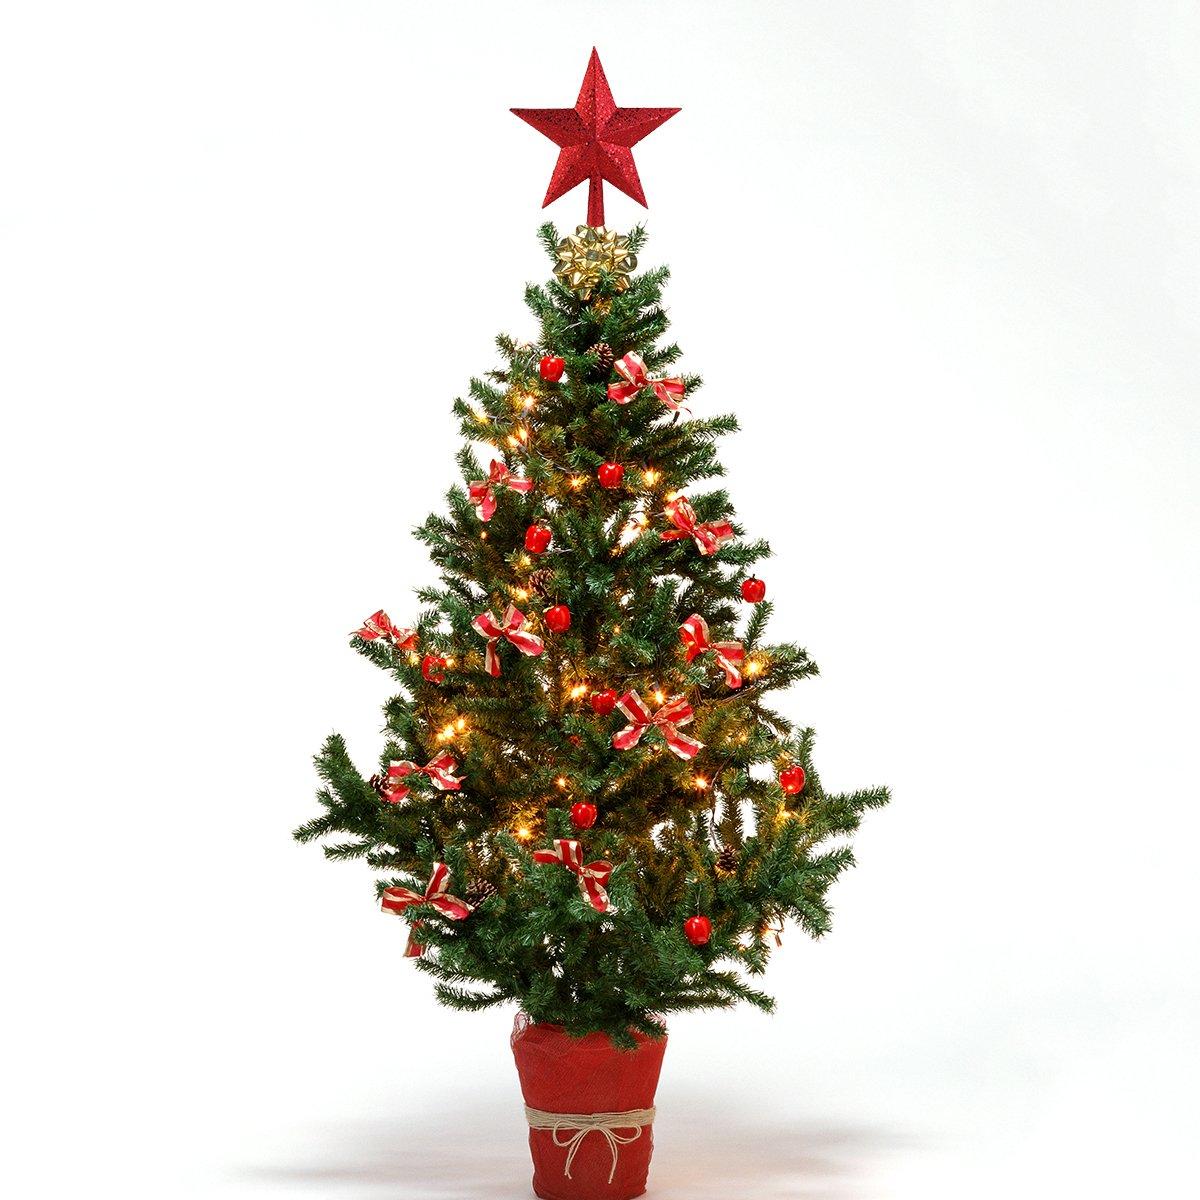 Amazon.com: NICEXMAS Christmas Tree Toppers Star Treasures Glittered ...